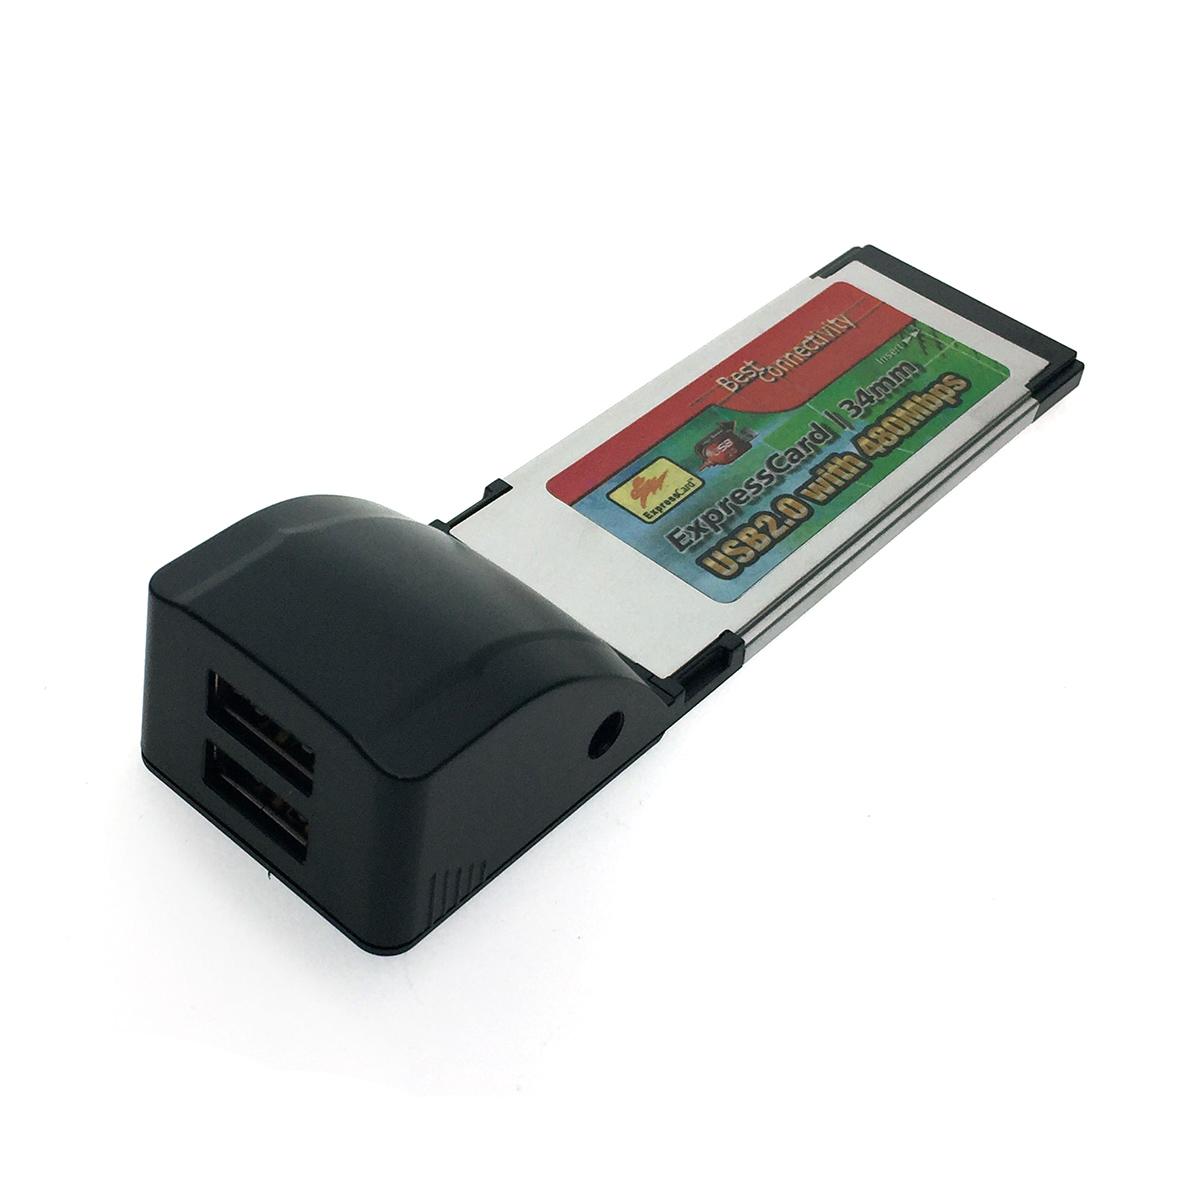 Адаптер Expresscard/34mm to USB 2.0 2 port XN114-2-B1 Espada box